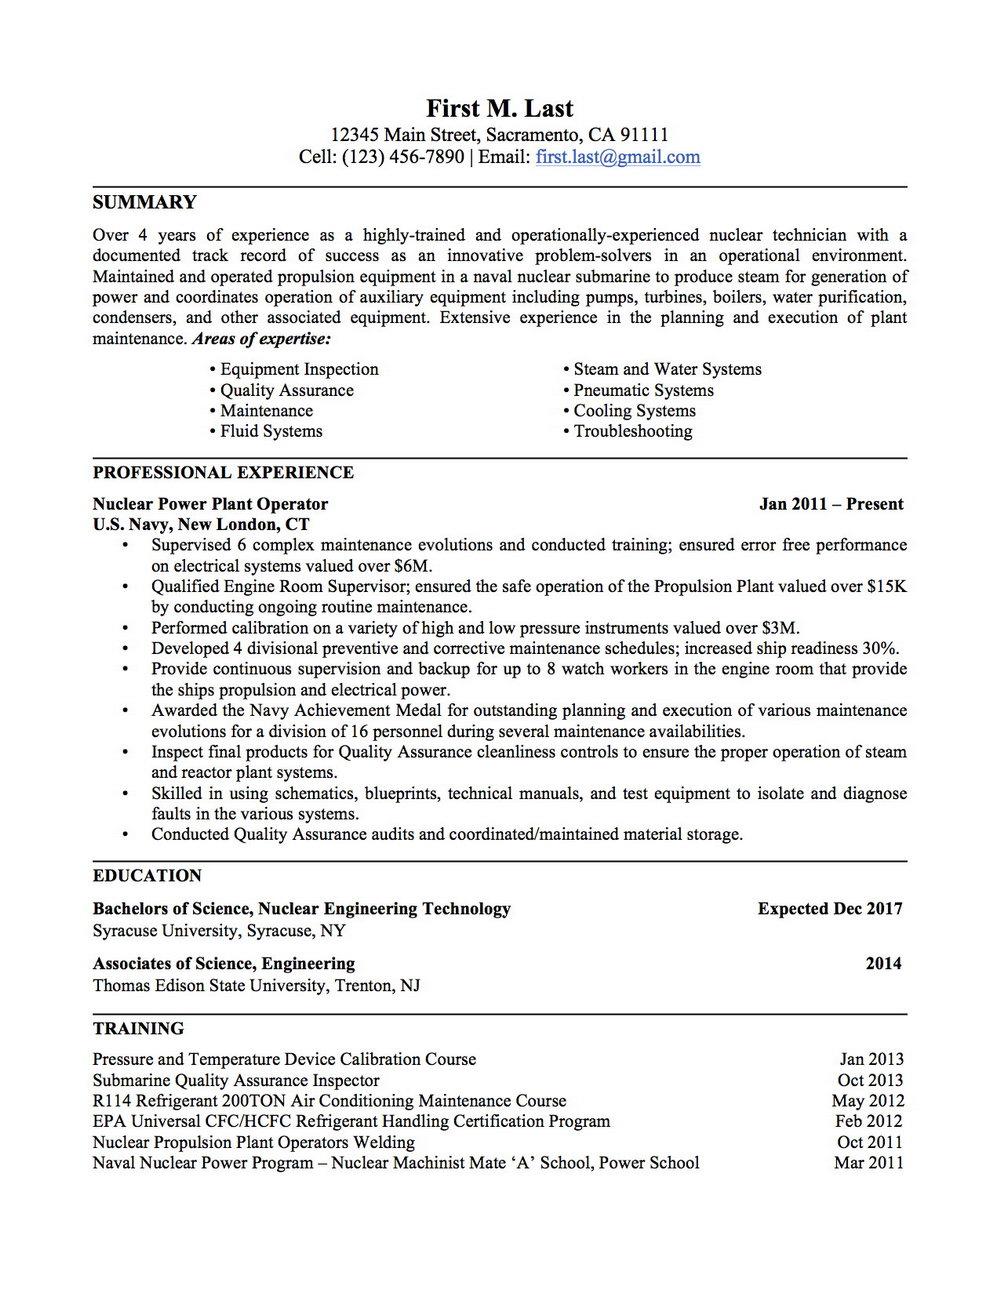 Military To Civilian Resume Help